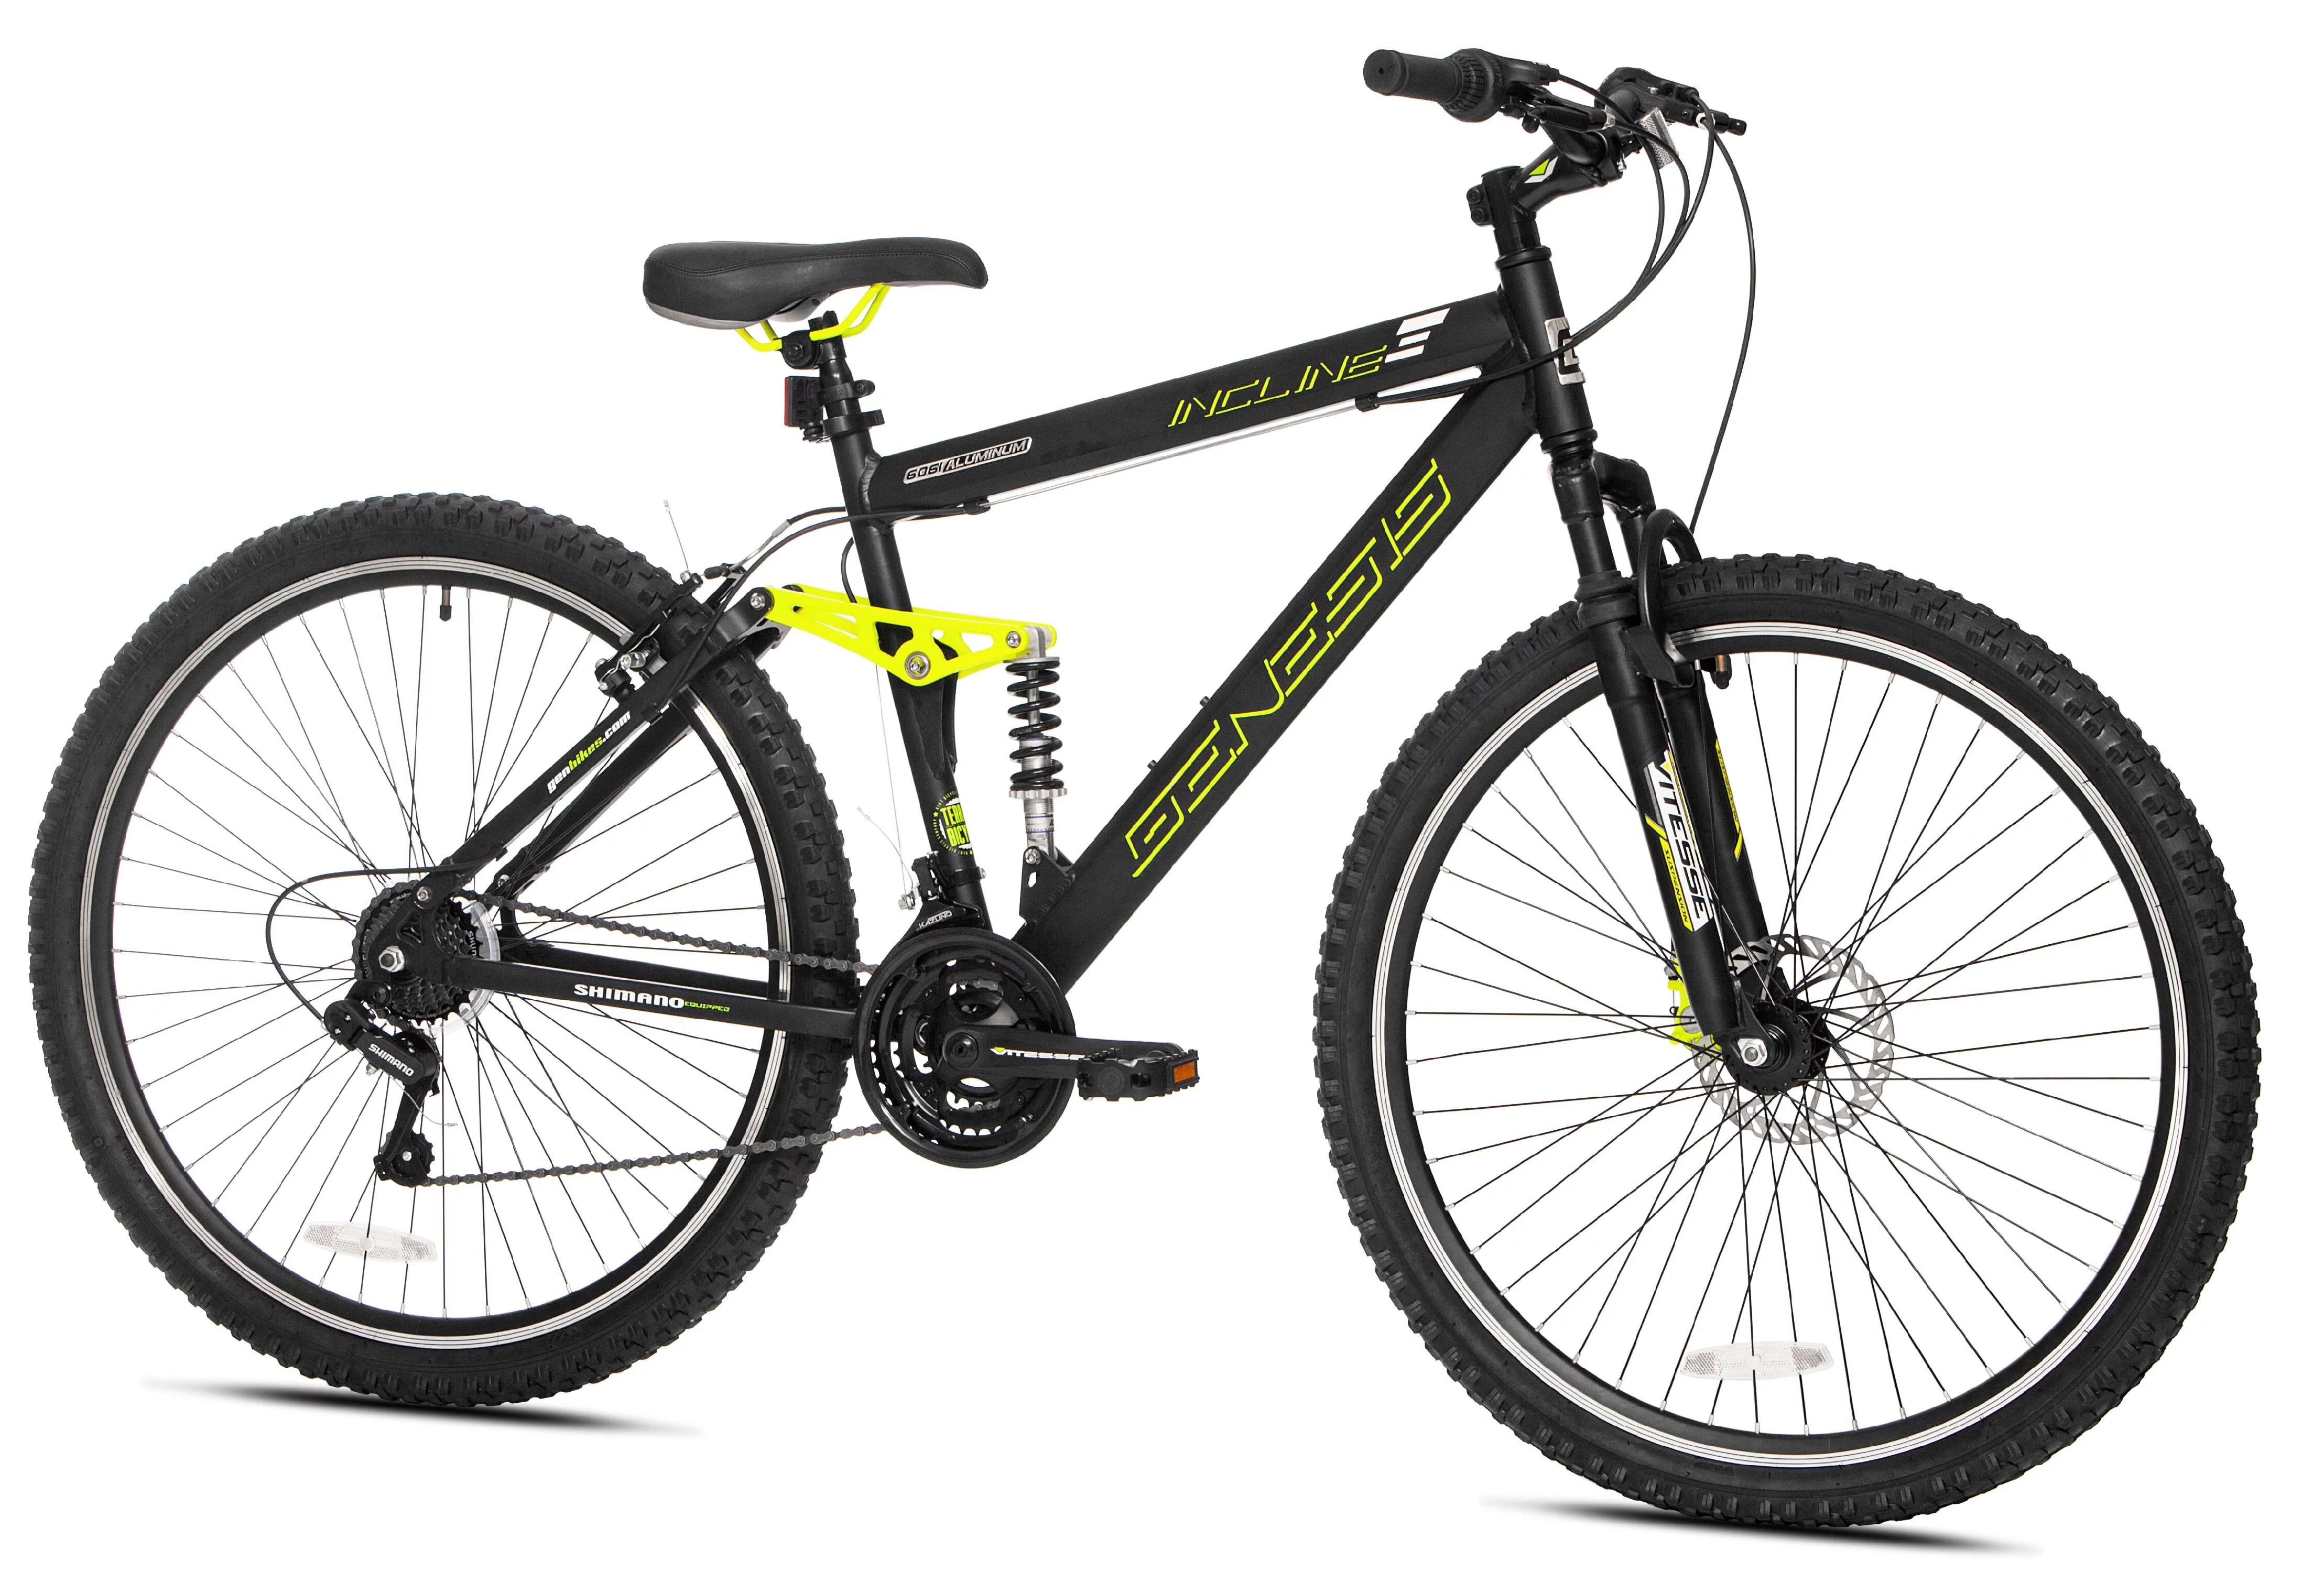 Genesis 29 Incline Men S Mountain Bike Black Yellow